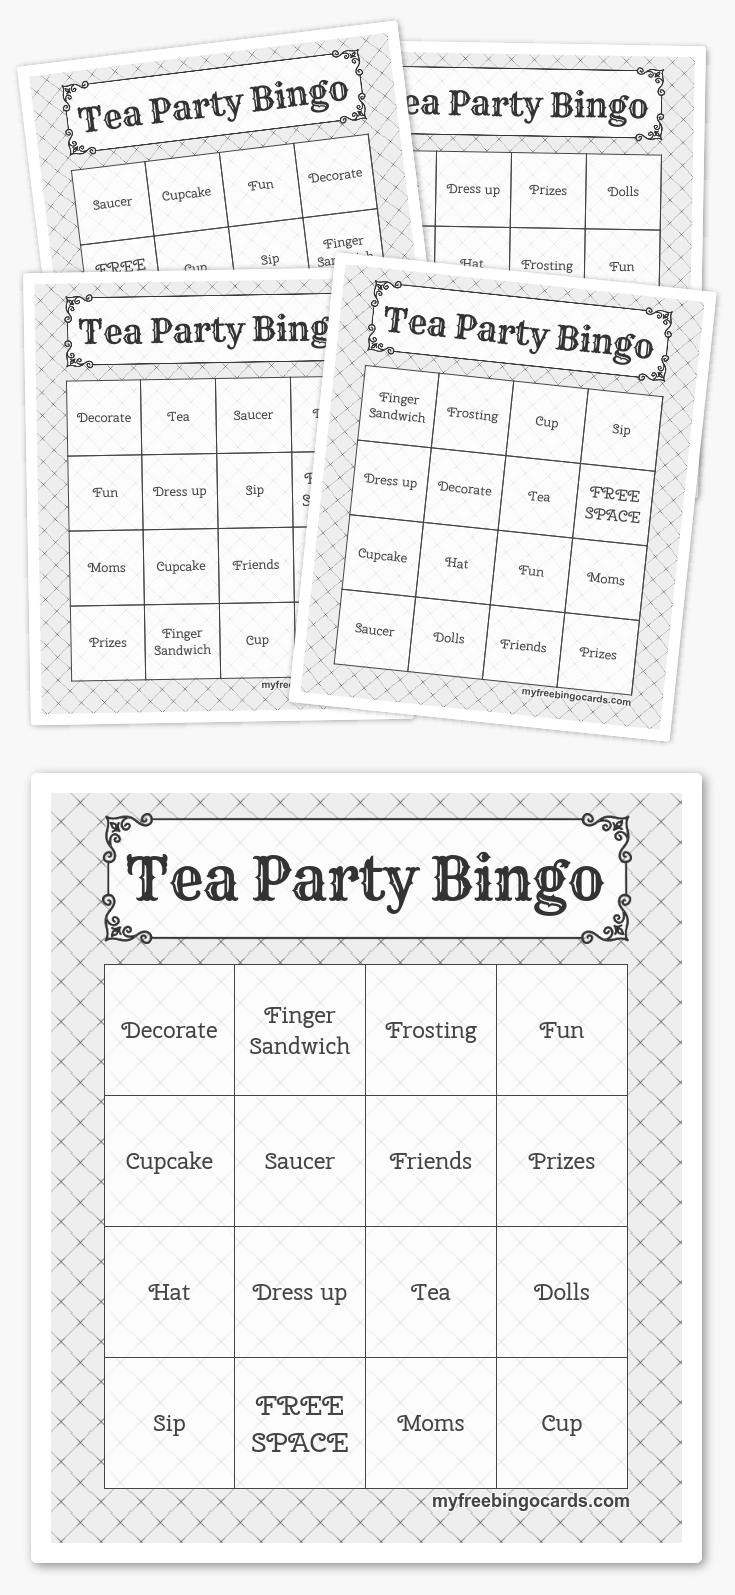 Free Printable Bingo Cards In 2019 | Printables | Harry Potter Games - Free Printable Bingo Games